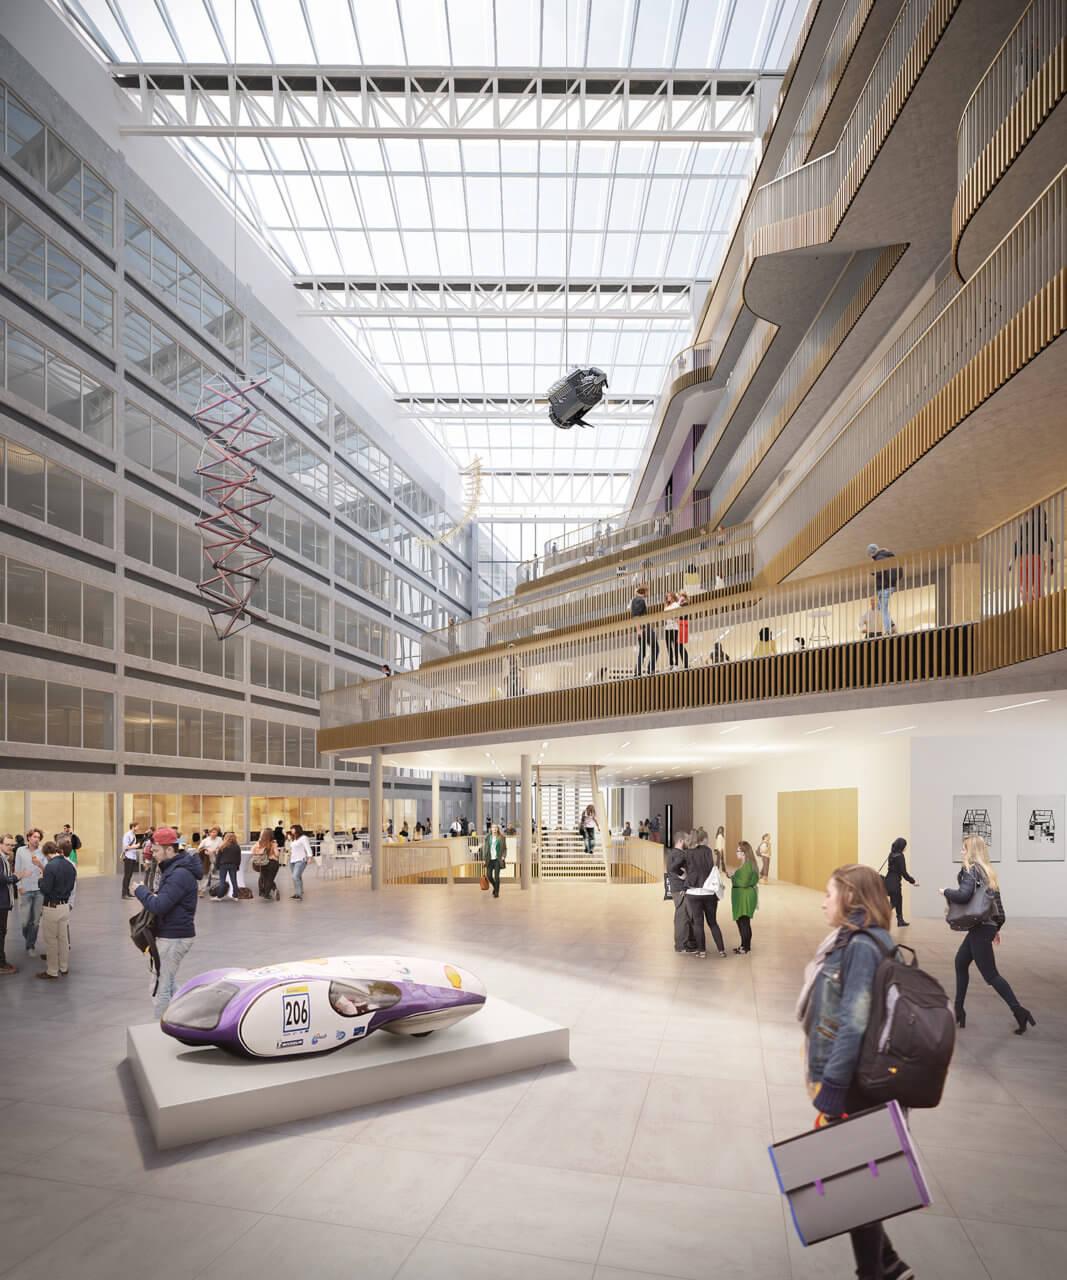 Powerhouse Company - Rhijnspoorgebouw - atrium - Image by 3dstudio prins sm